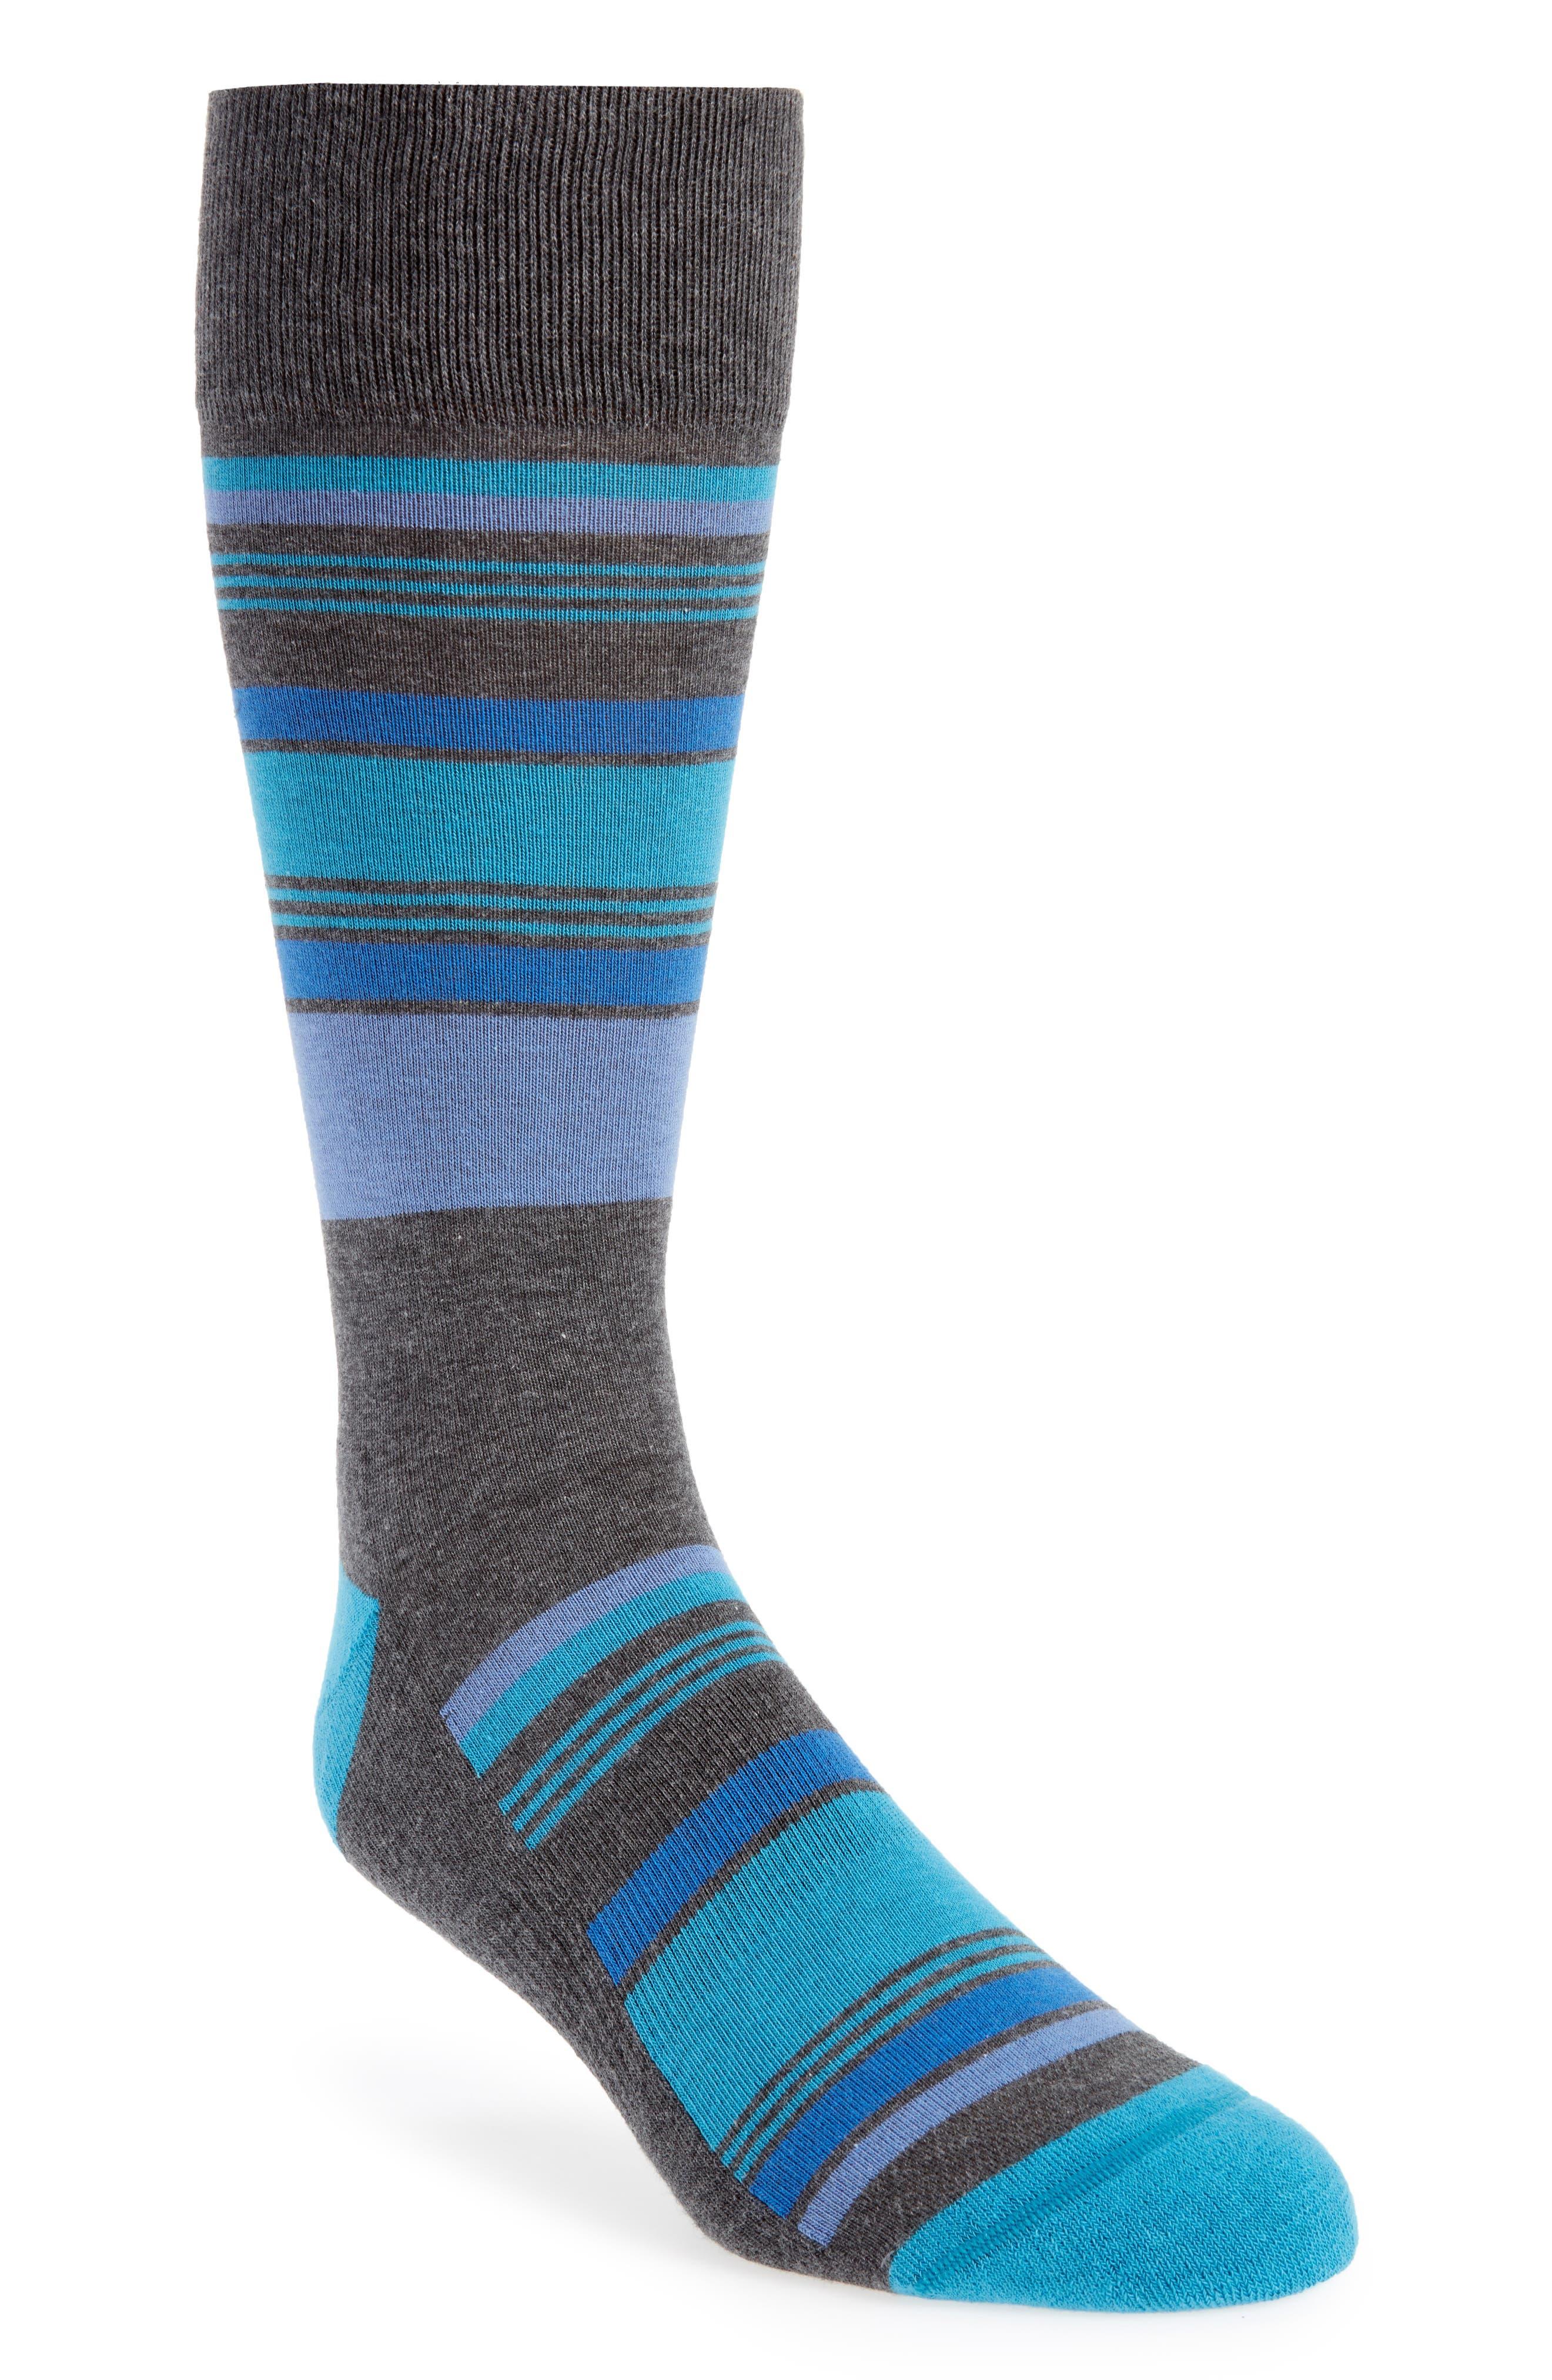 Mixed Uneven Stripe Socks,                             Main thumbnail 1, color,                             BLUE/ CHARCOAL